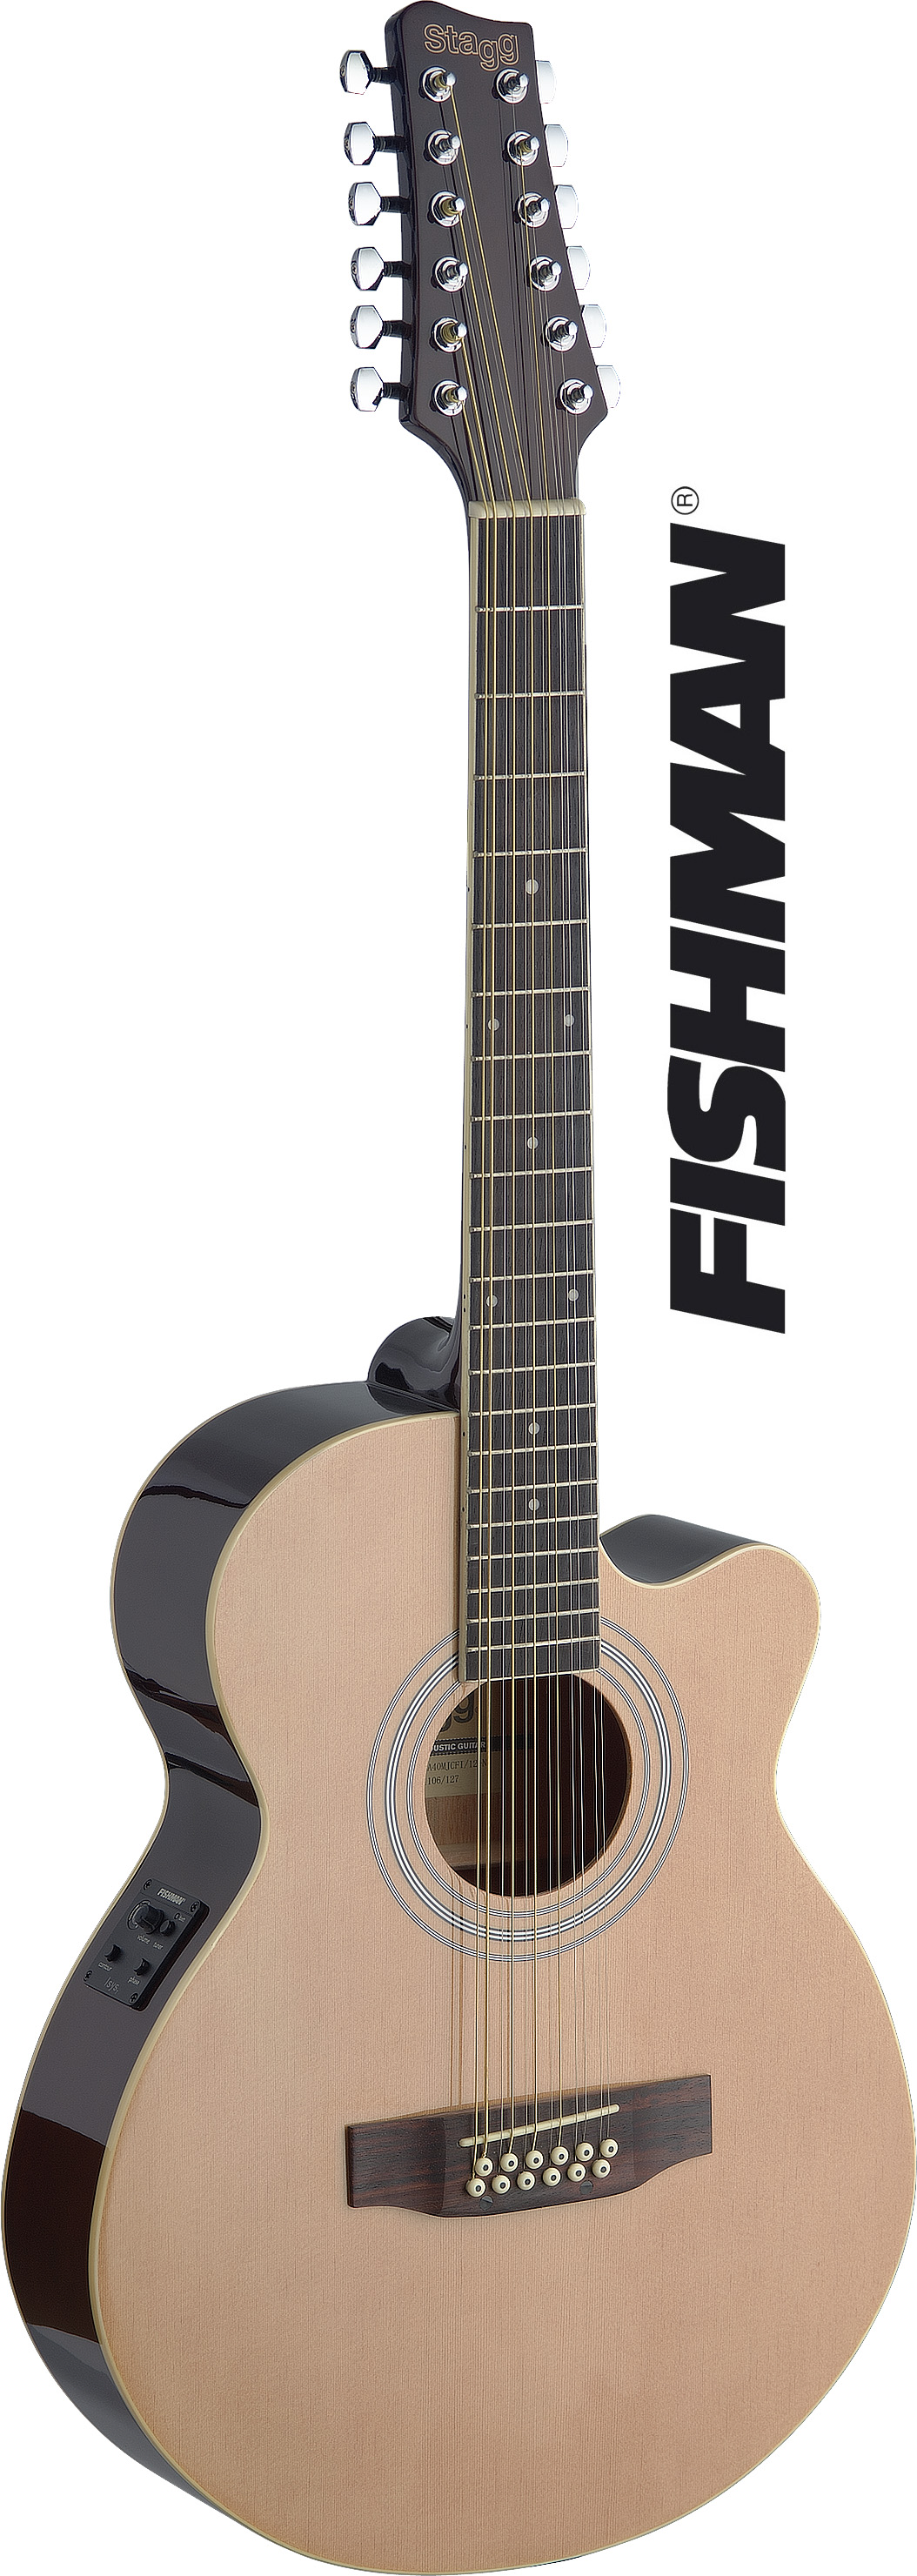 Stagg SA40MJCFI/12-N, elektroakustická kytara typu Mini Jumbo, dvanáctistrunná